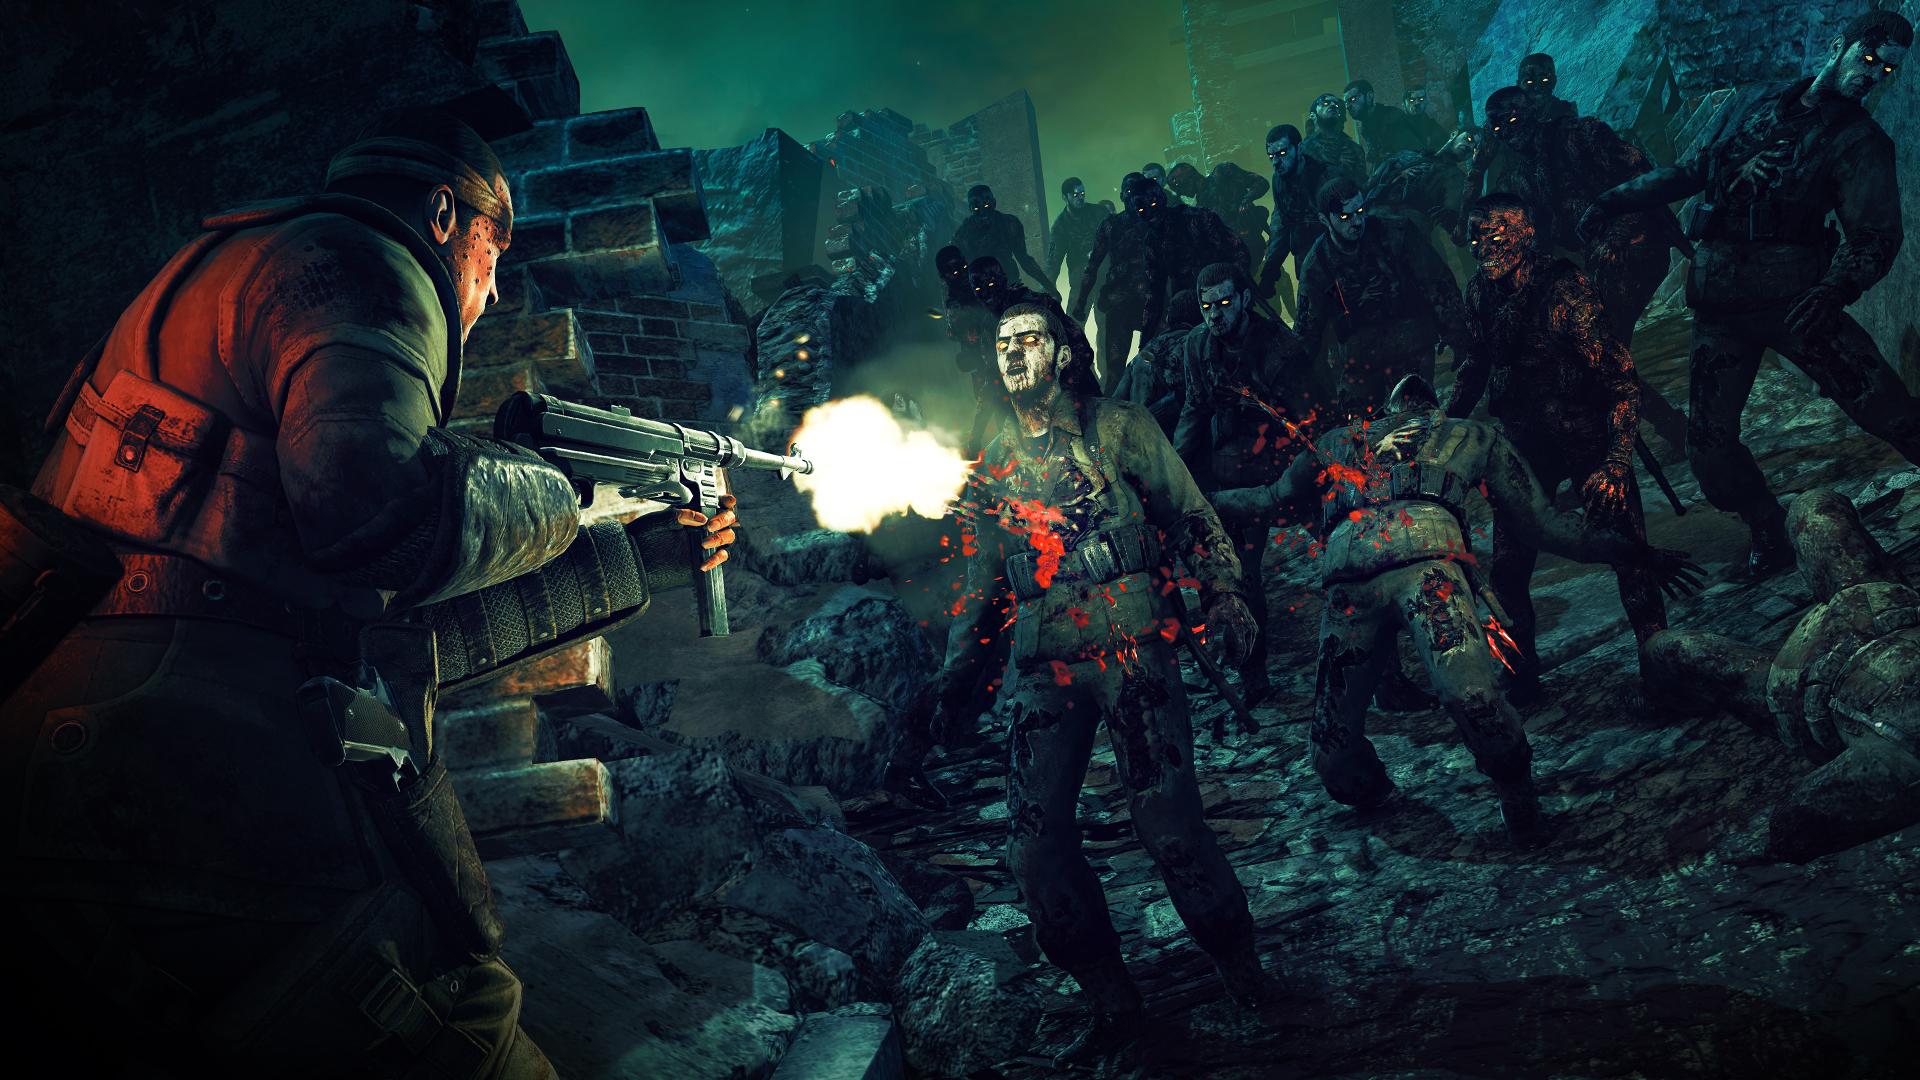 Zombie Army Trilogy on Steam